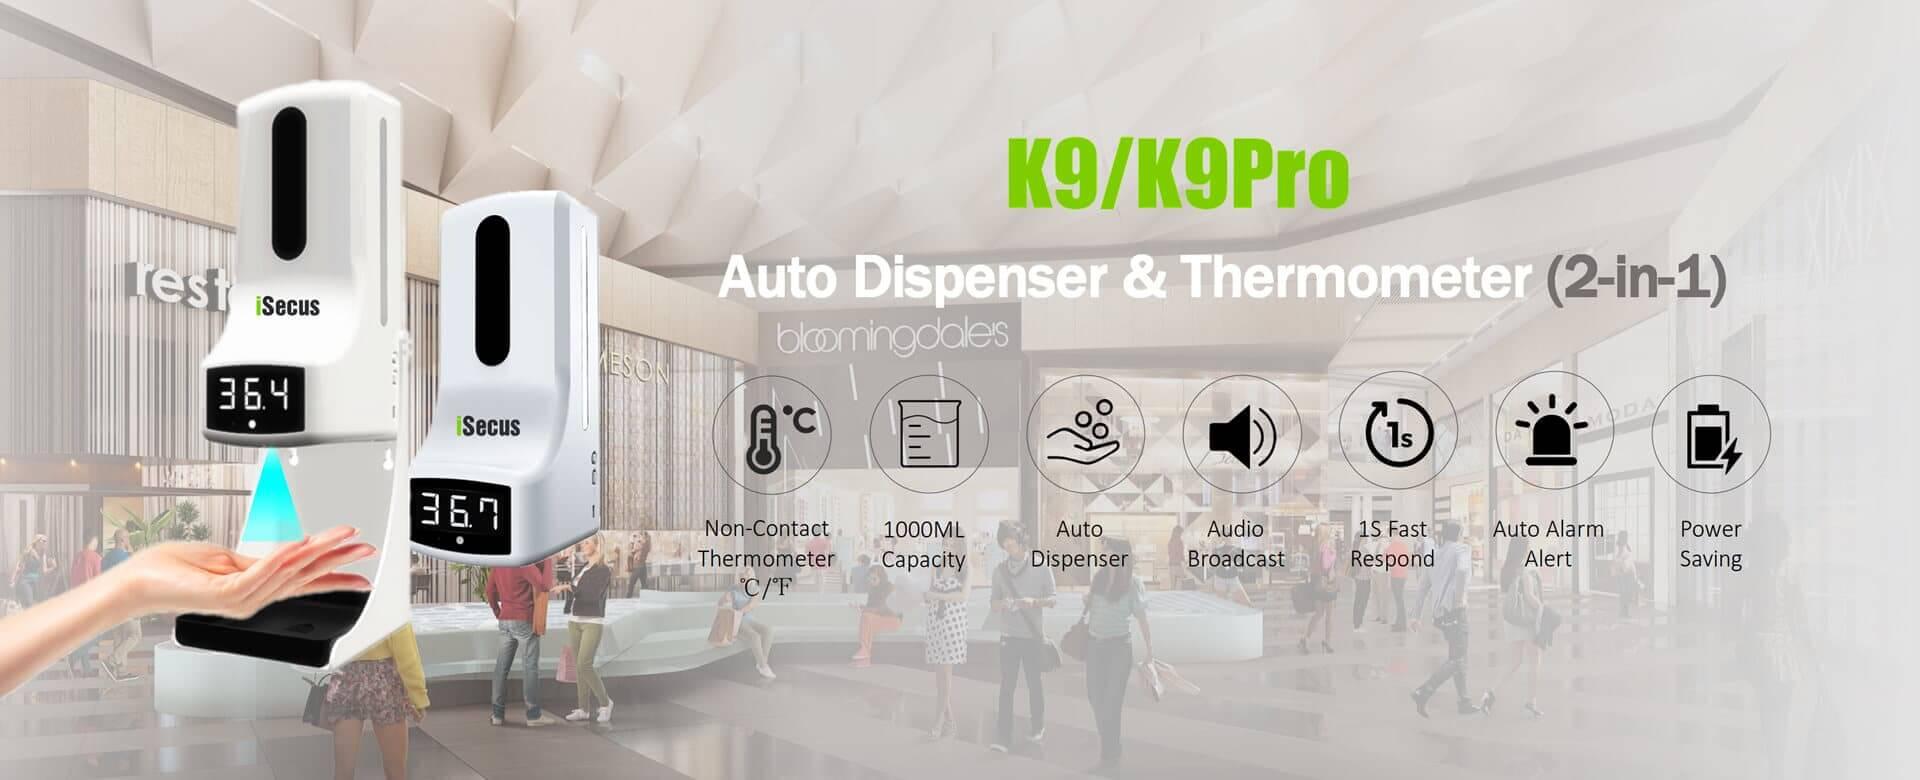 K9-K9Pro Auto Dispenser Banner-www.isecus.com